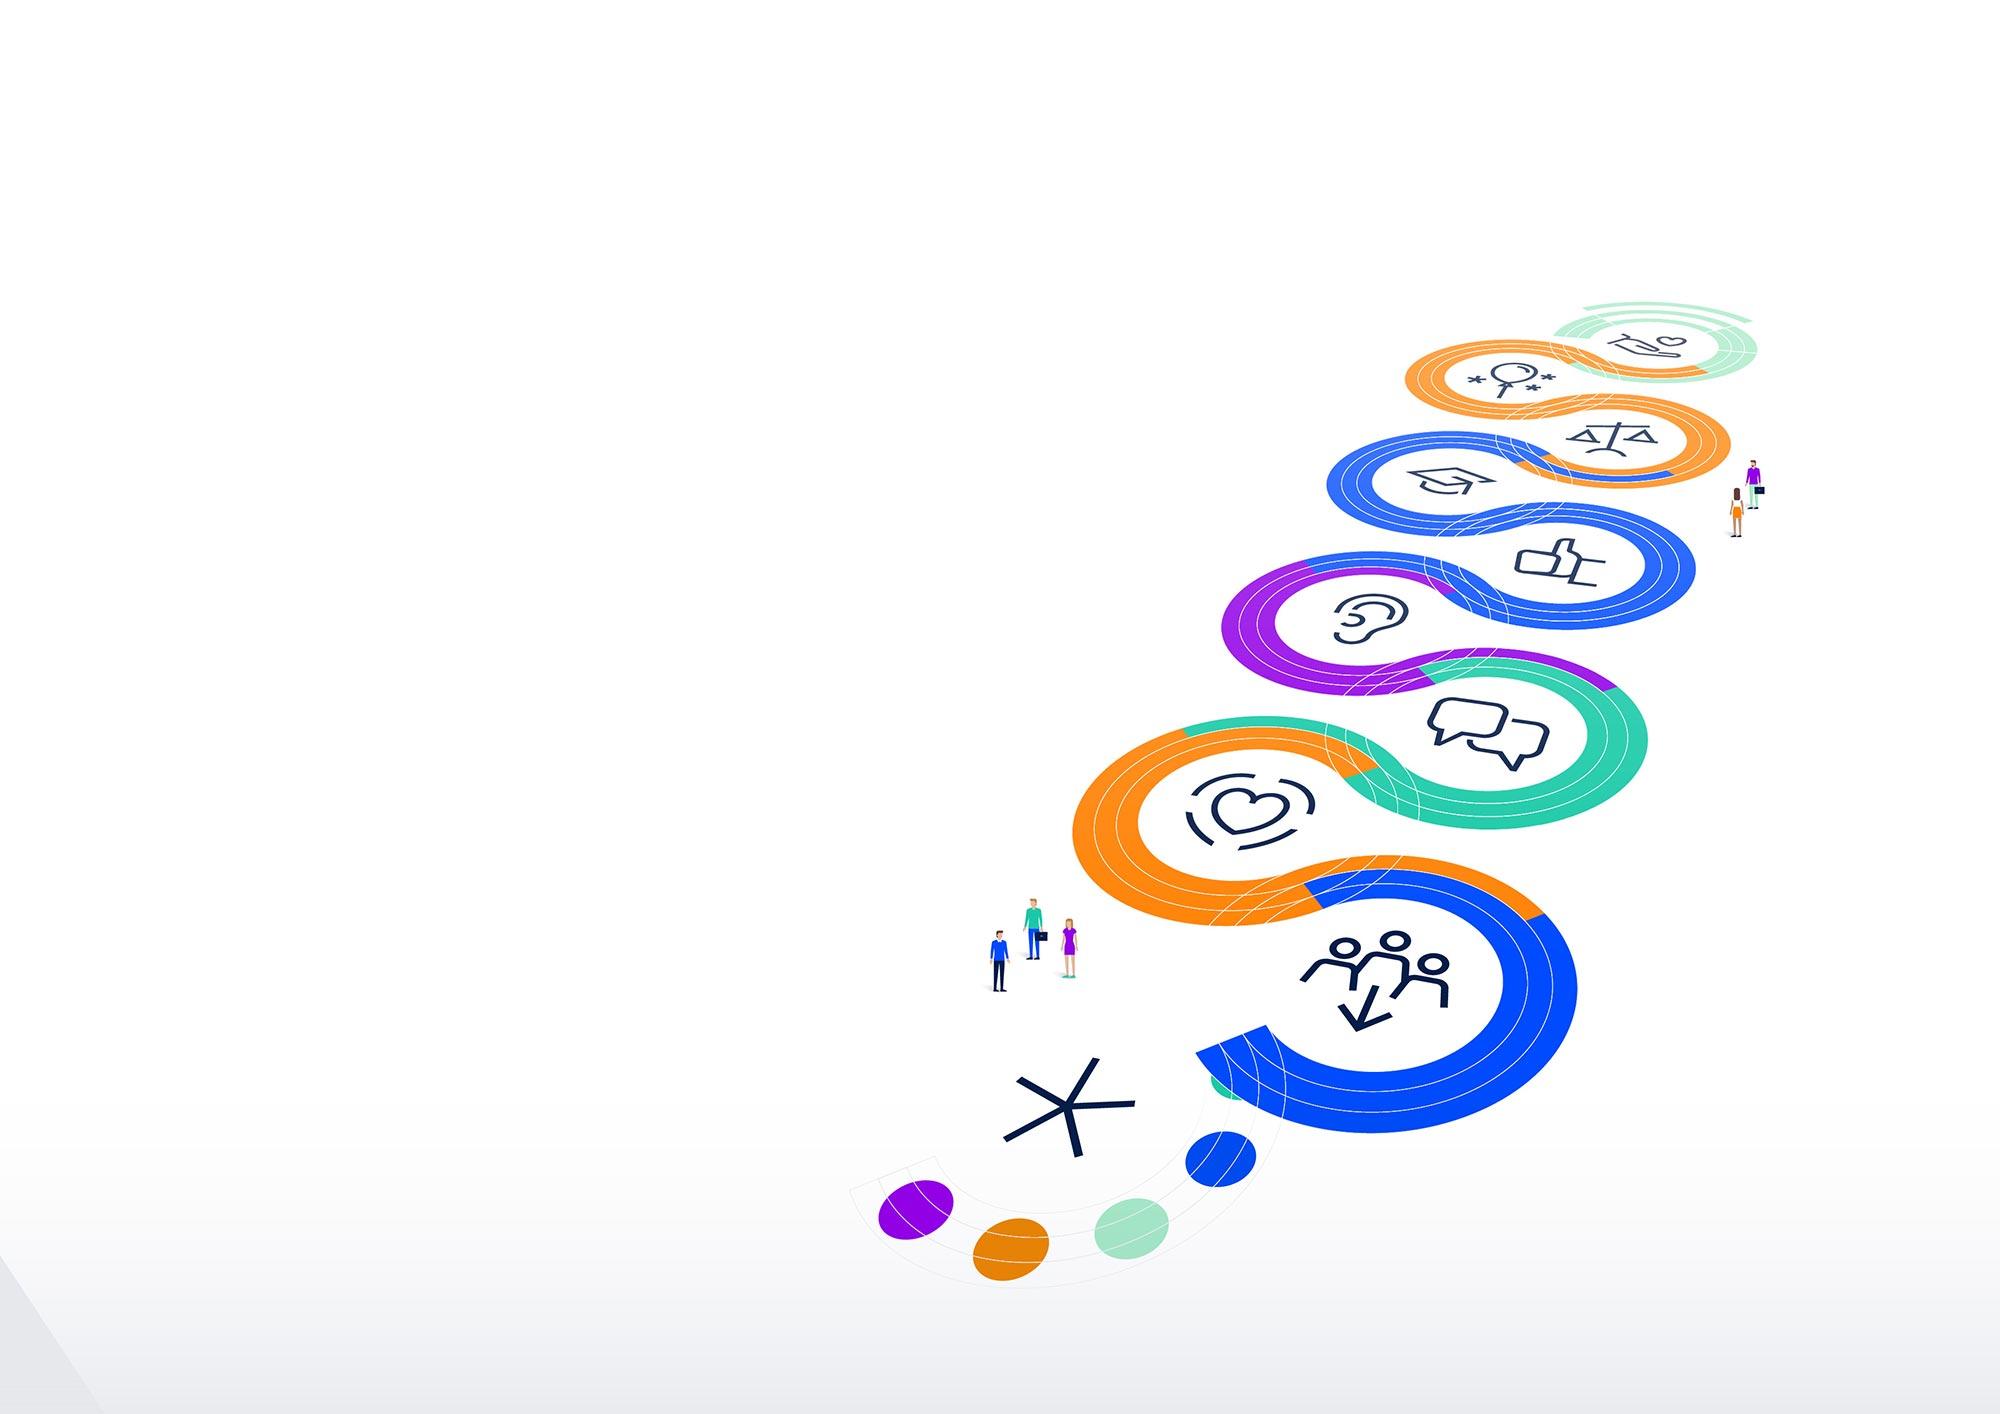 Abbvie Culture Audit visuals BEX Communicatie infographic ontwerp JAgd